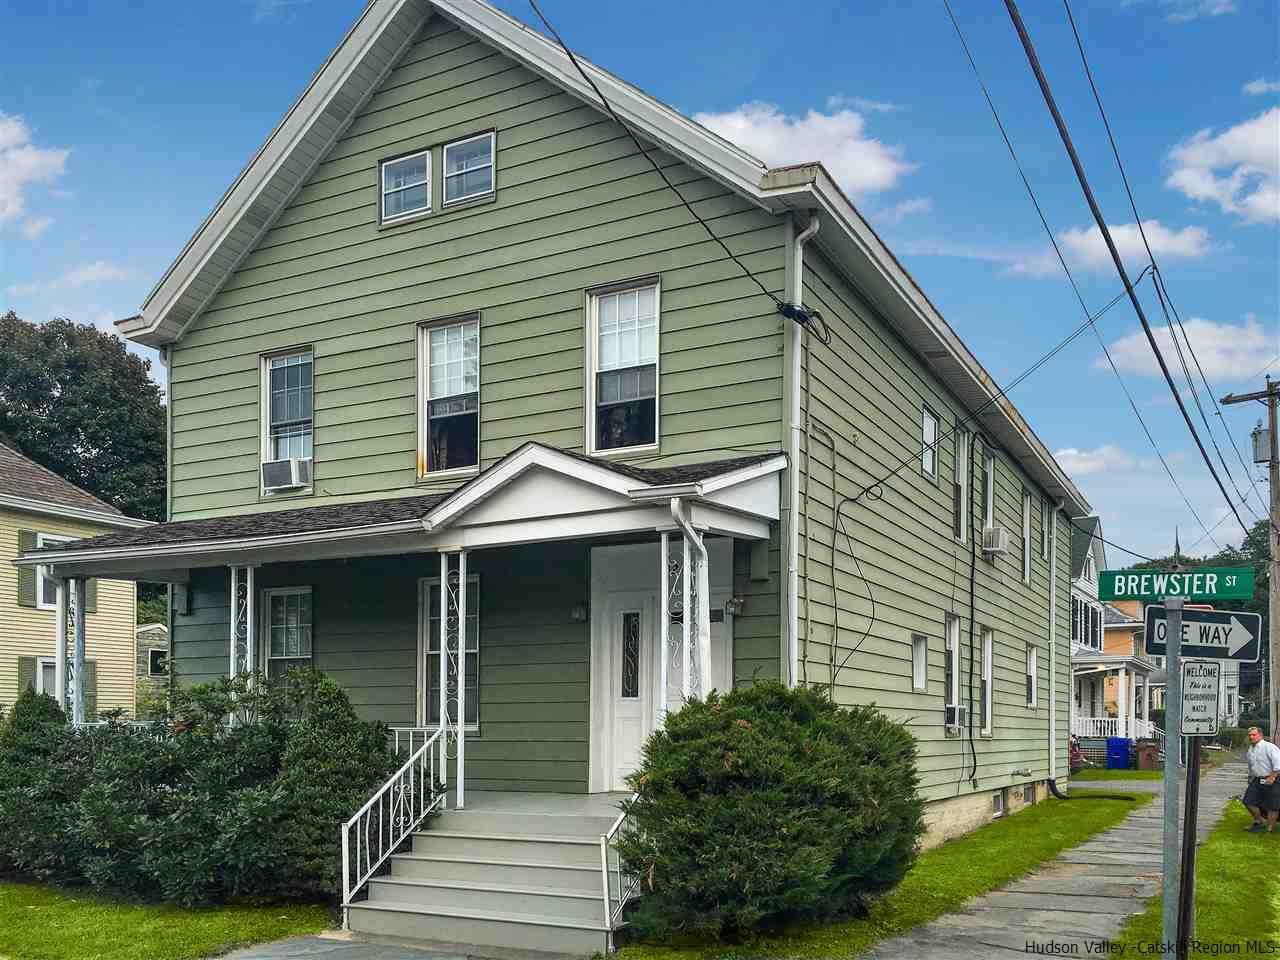 42 Brewster St, Kingston, NY 12401